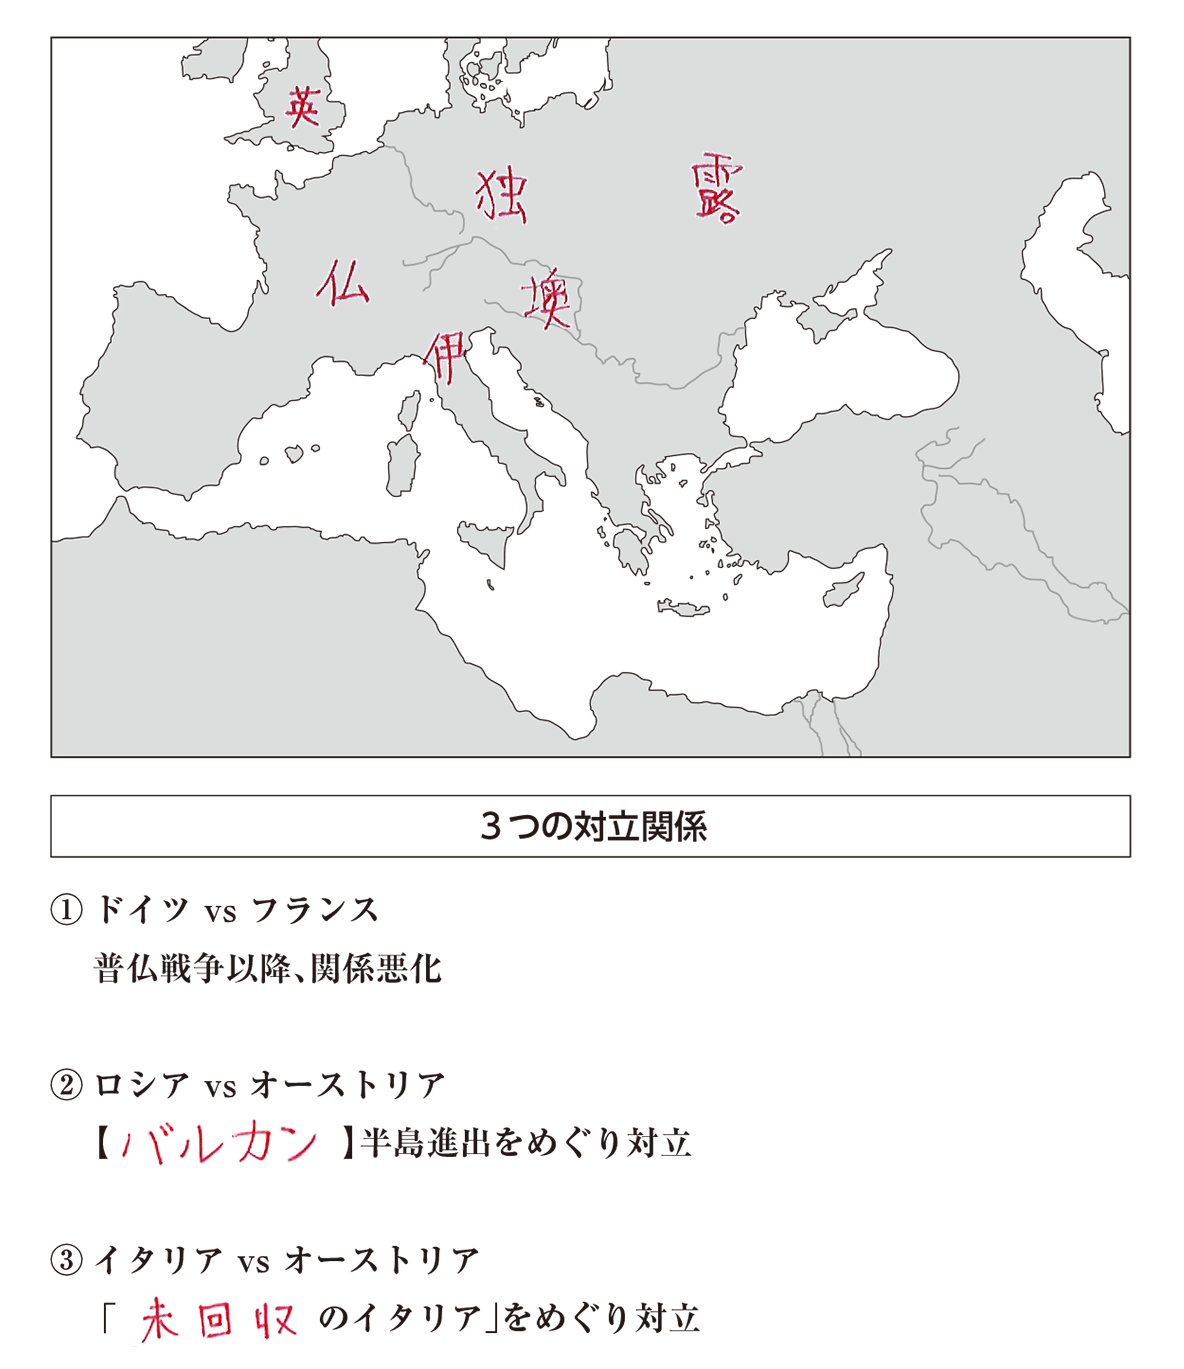 高校世界史 19世紀欧米諸国(1)7 ポイント1 答え全部